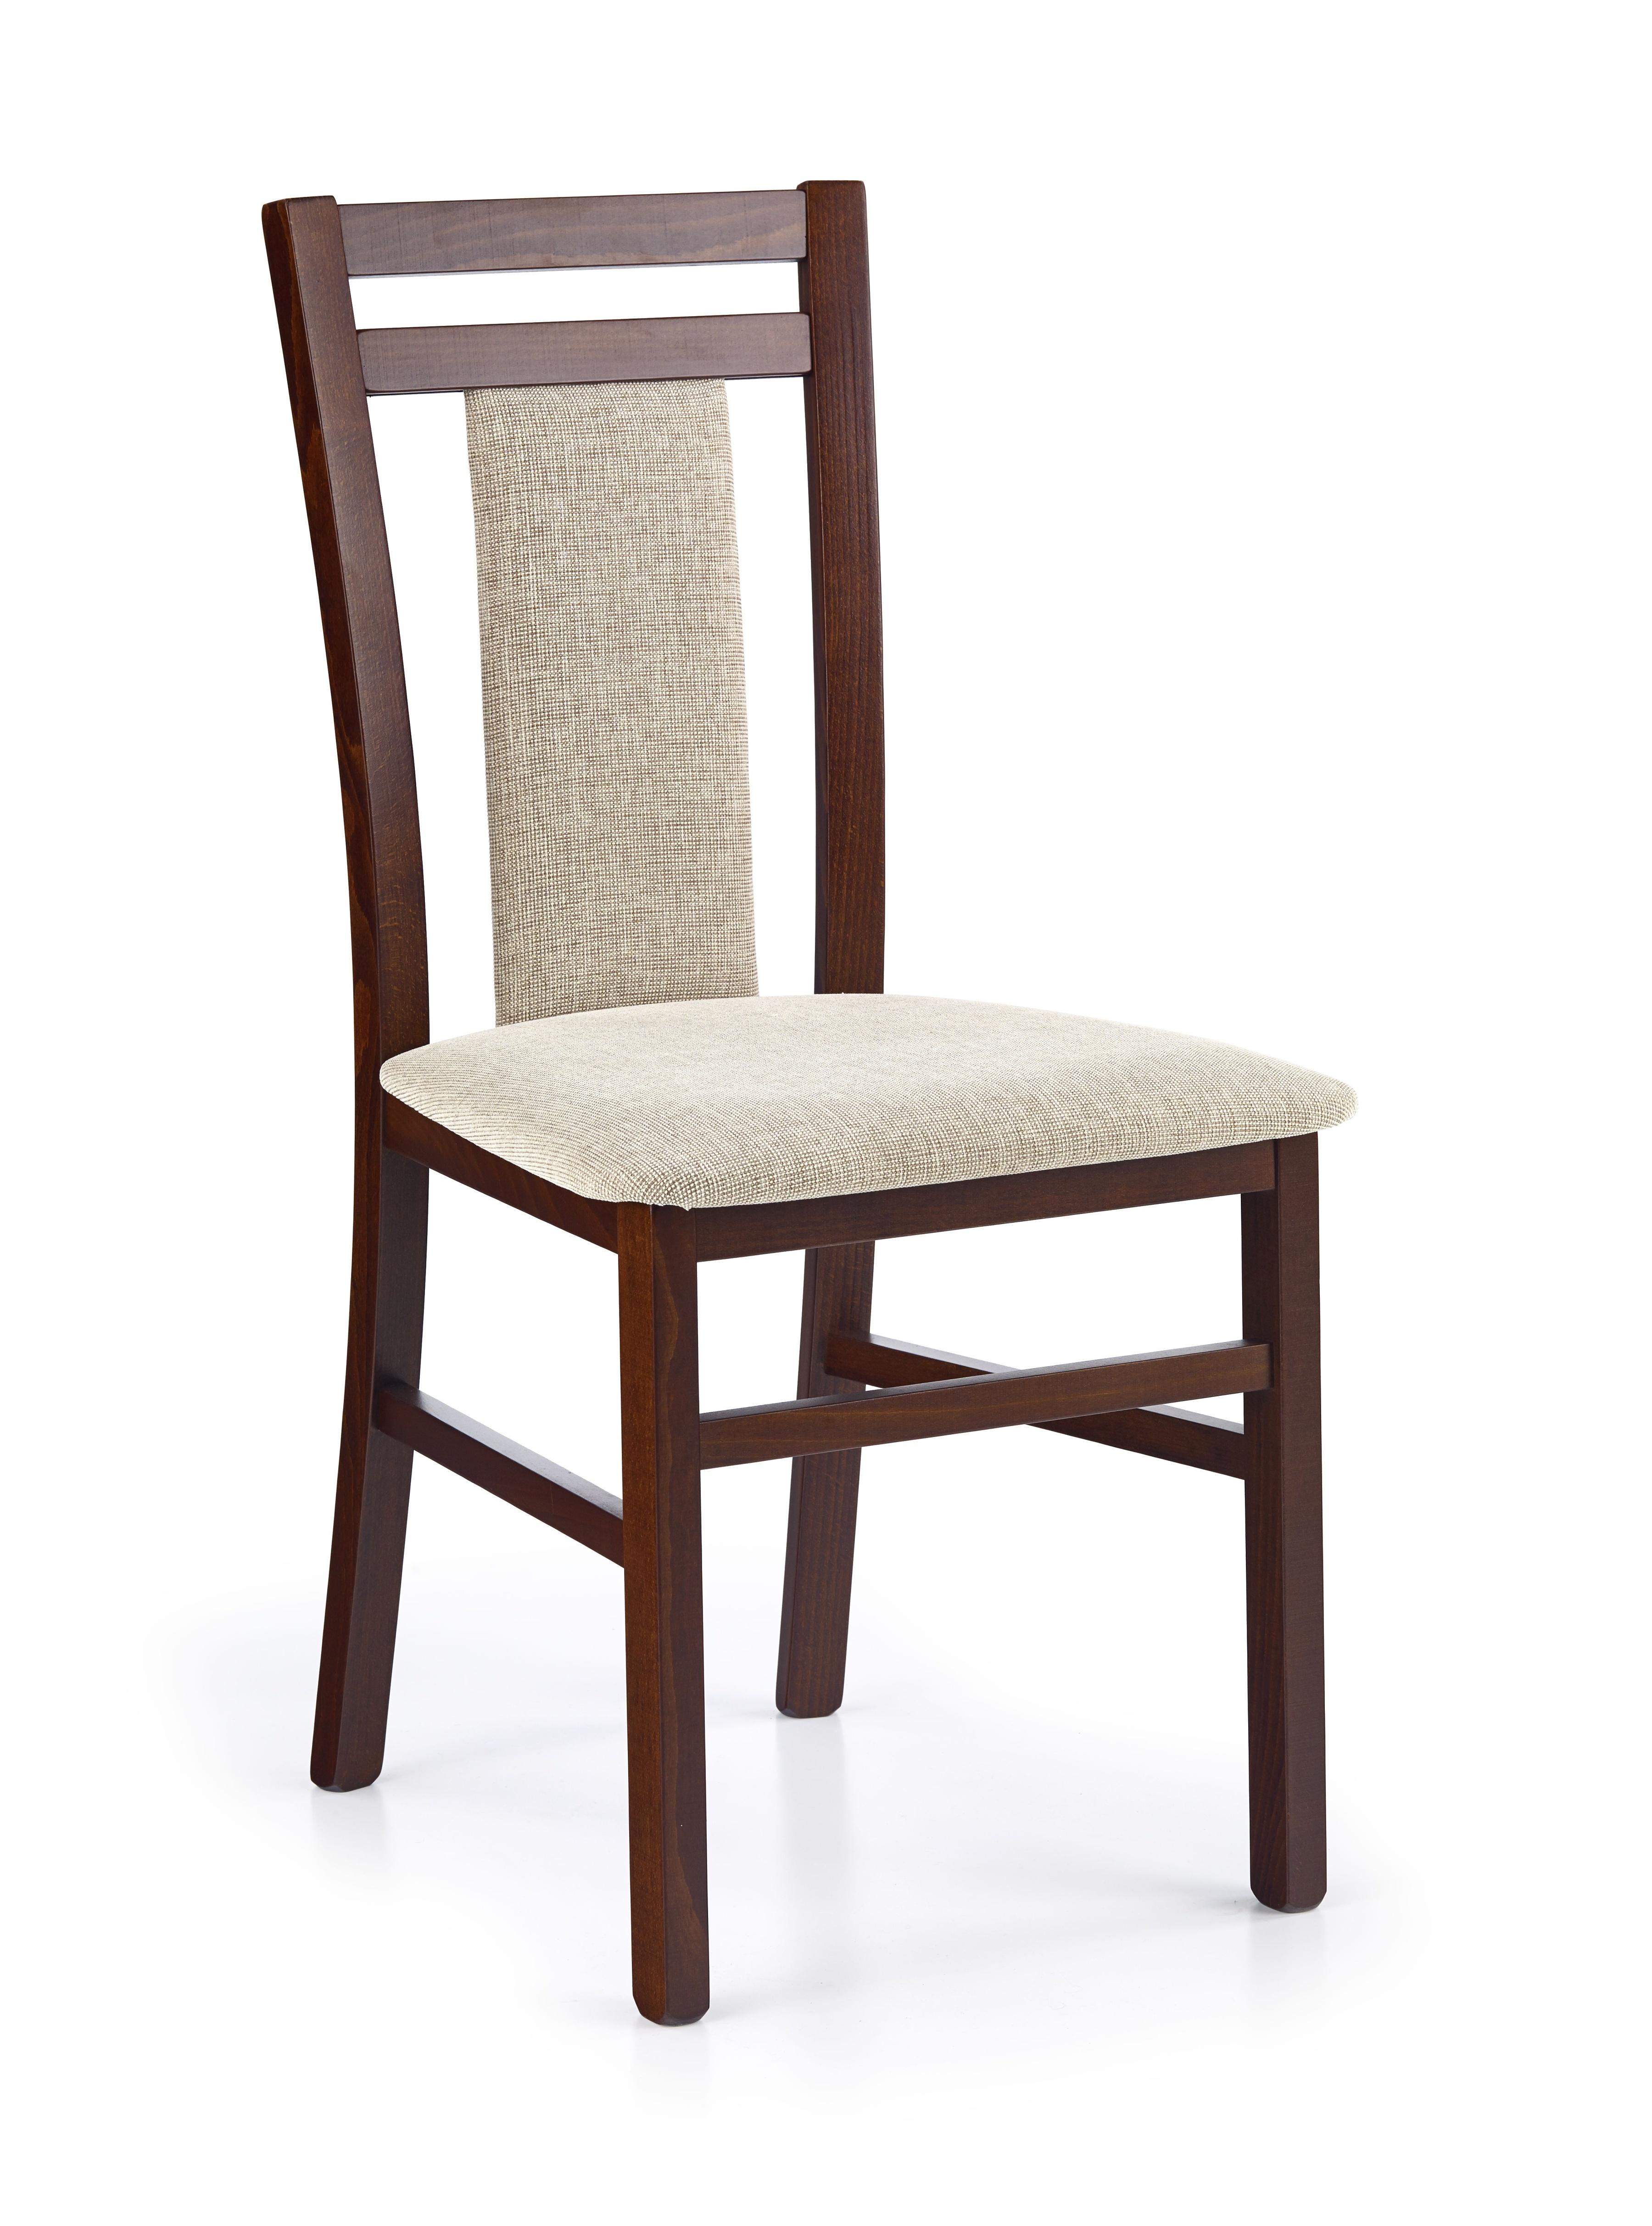 Jedálenská stolička - Halmar - HUBERT 8 Orech tmavy